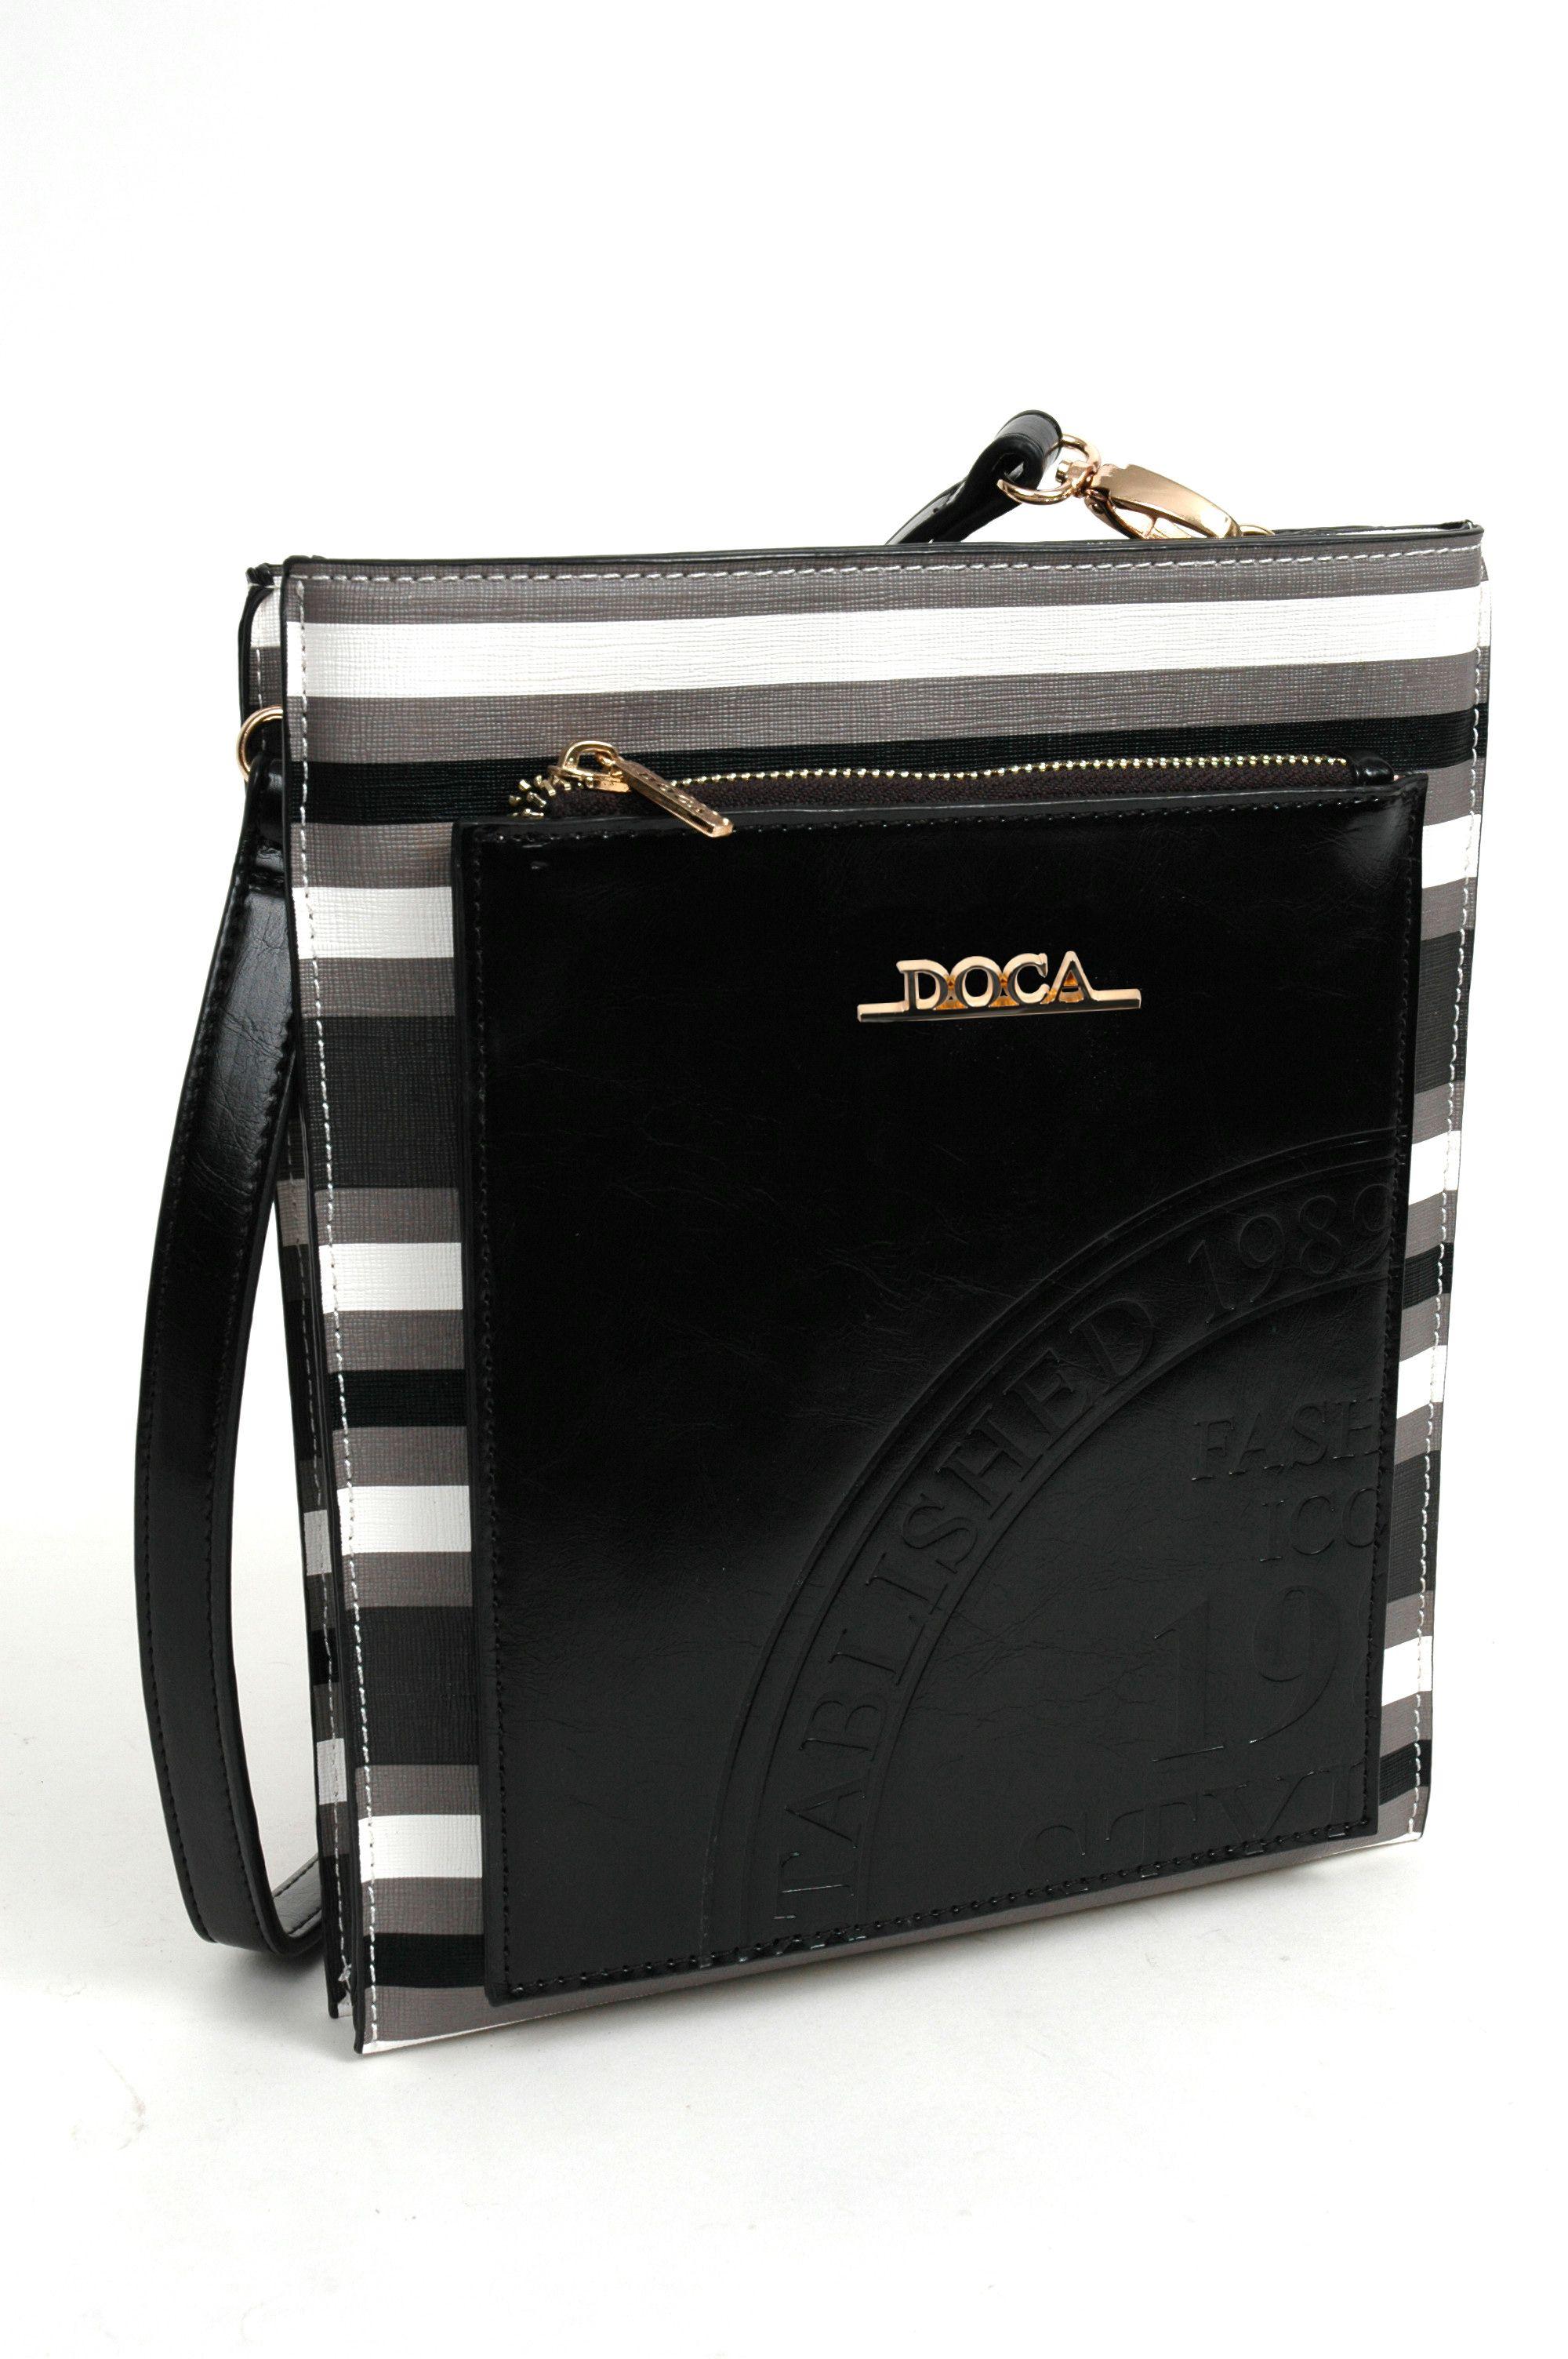 c2ee17d853 Τσάντες   DOCA Καθημερινή τσάντα